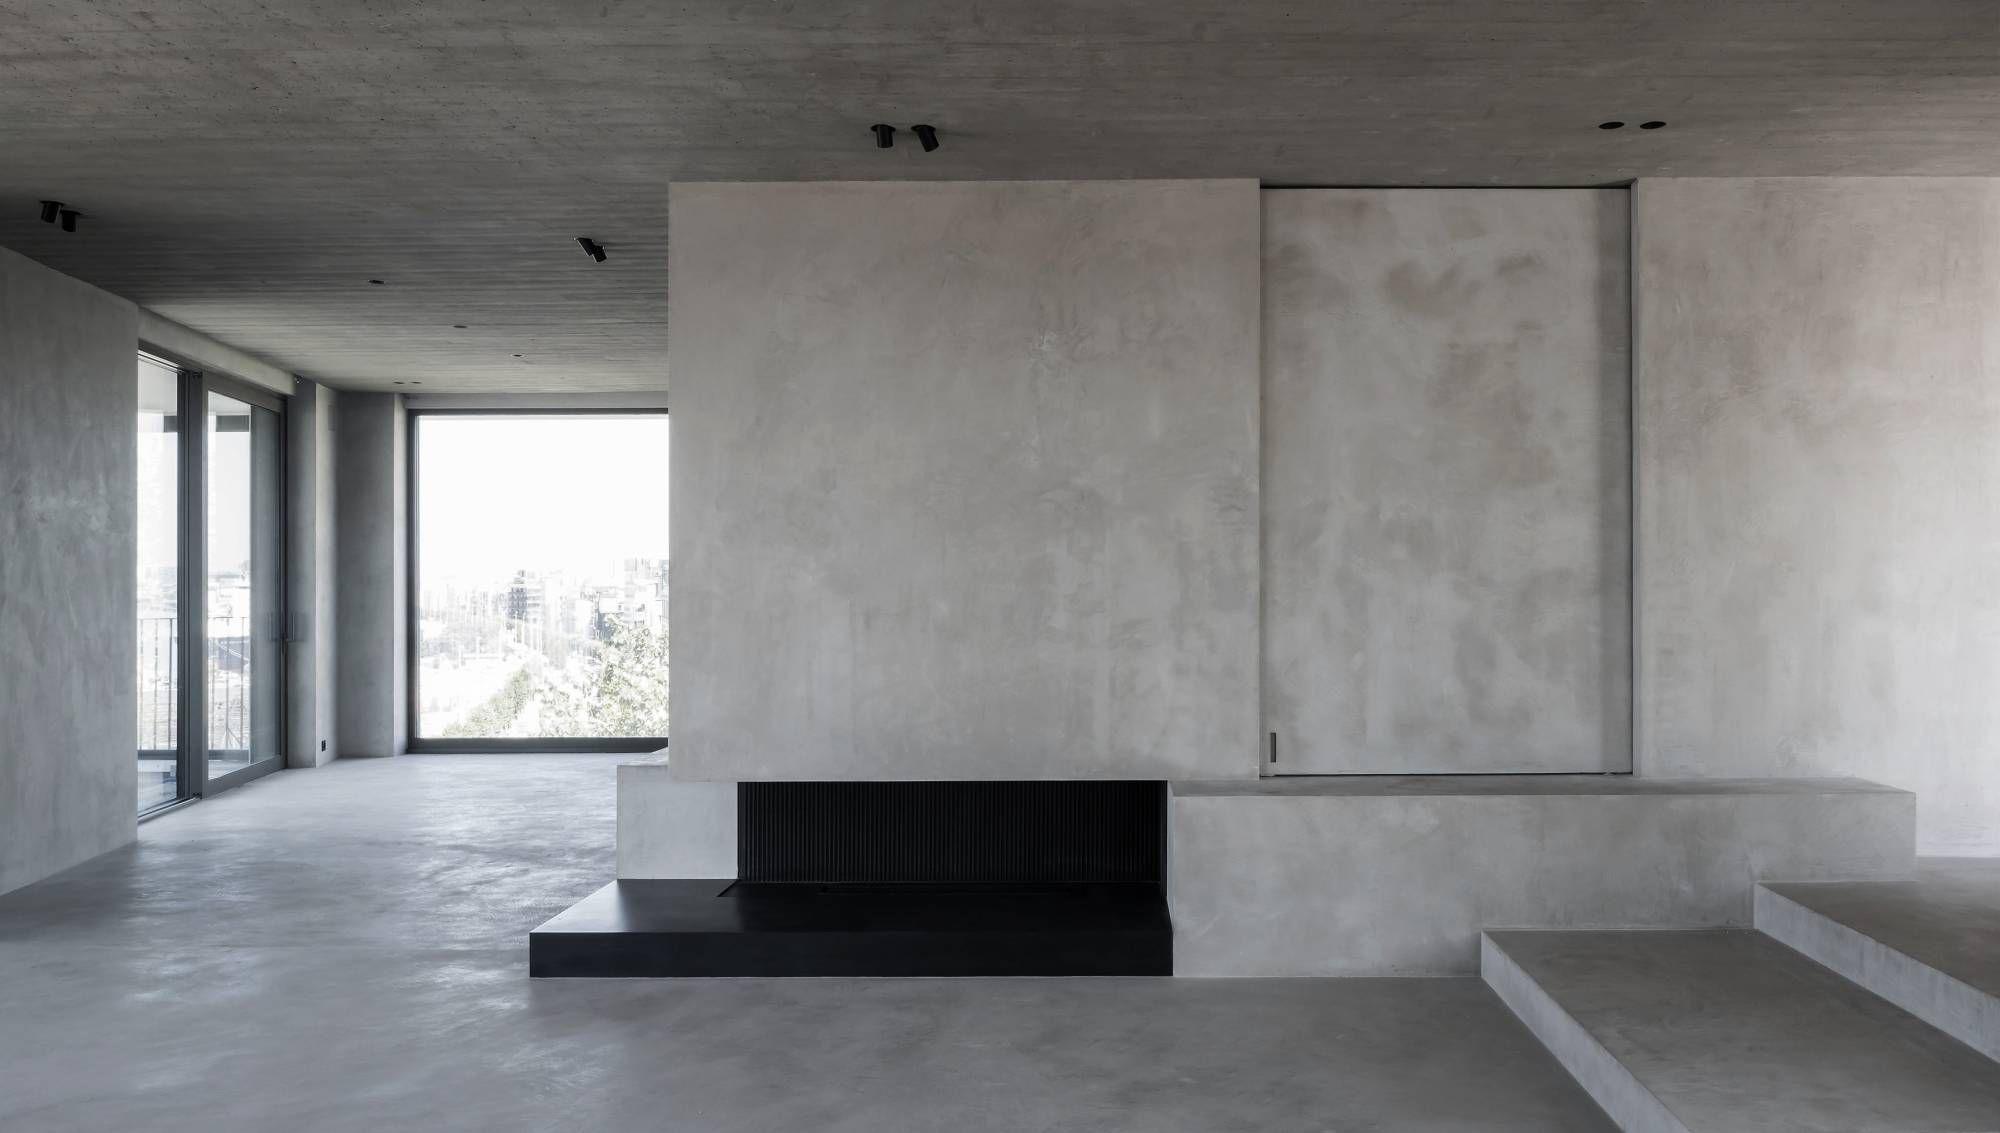 Neues projekt wunderschön gestaltetes penthouse in santa